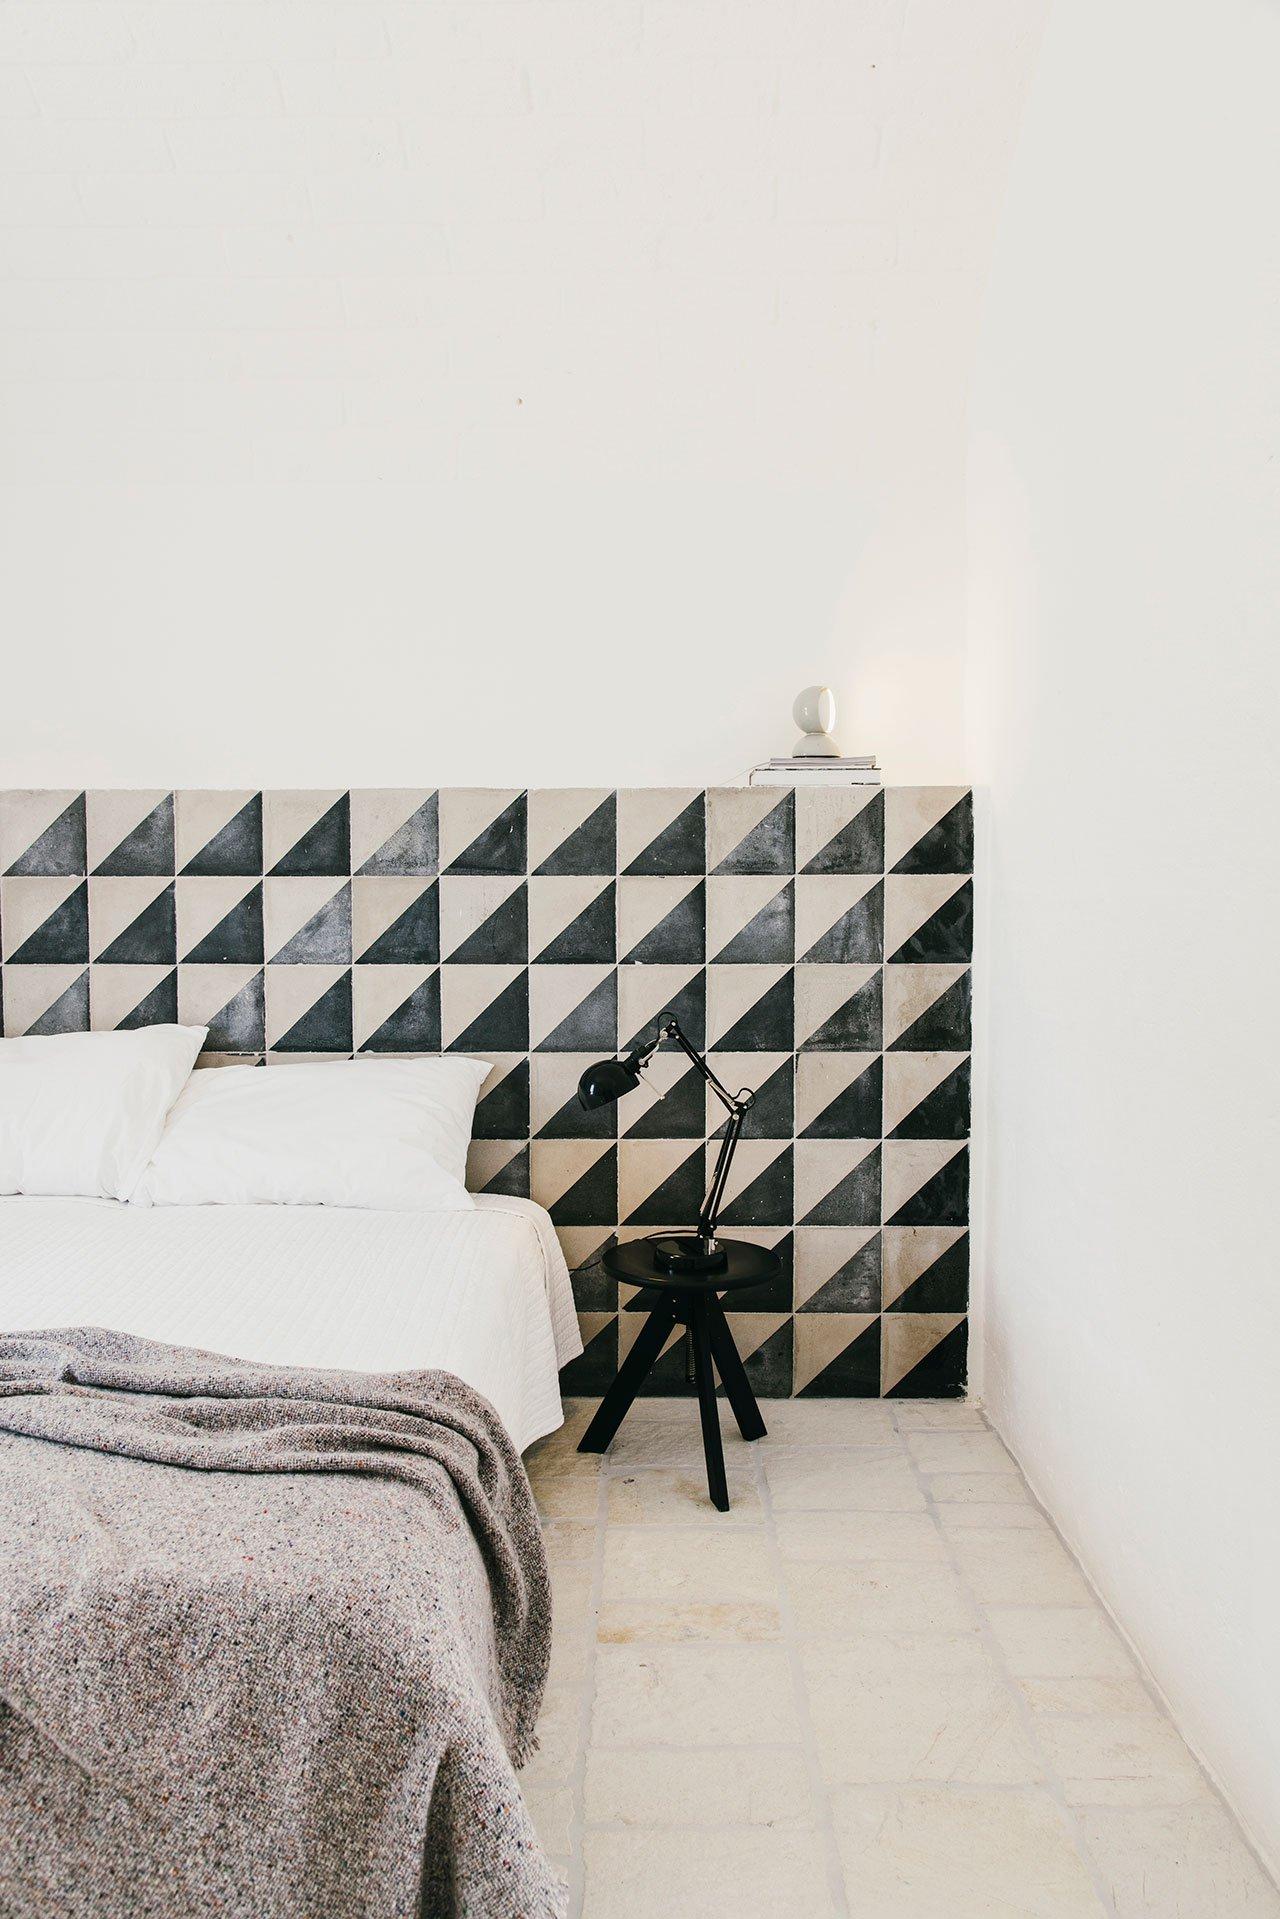 masseria design, italian interiors, puglia design, italianbark interior design blog, masseria moroseta, headboard decor tiles